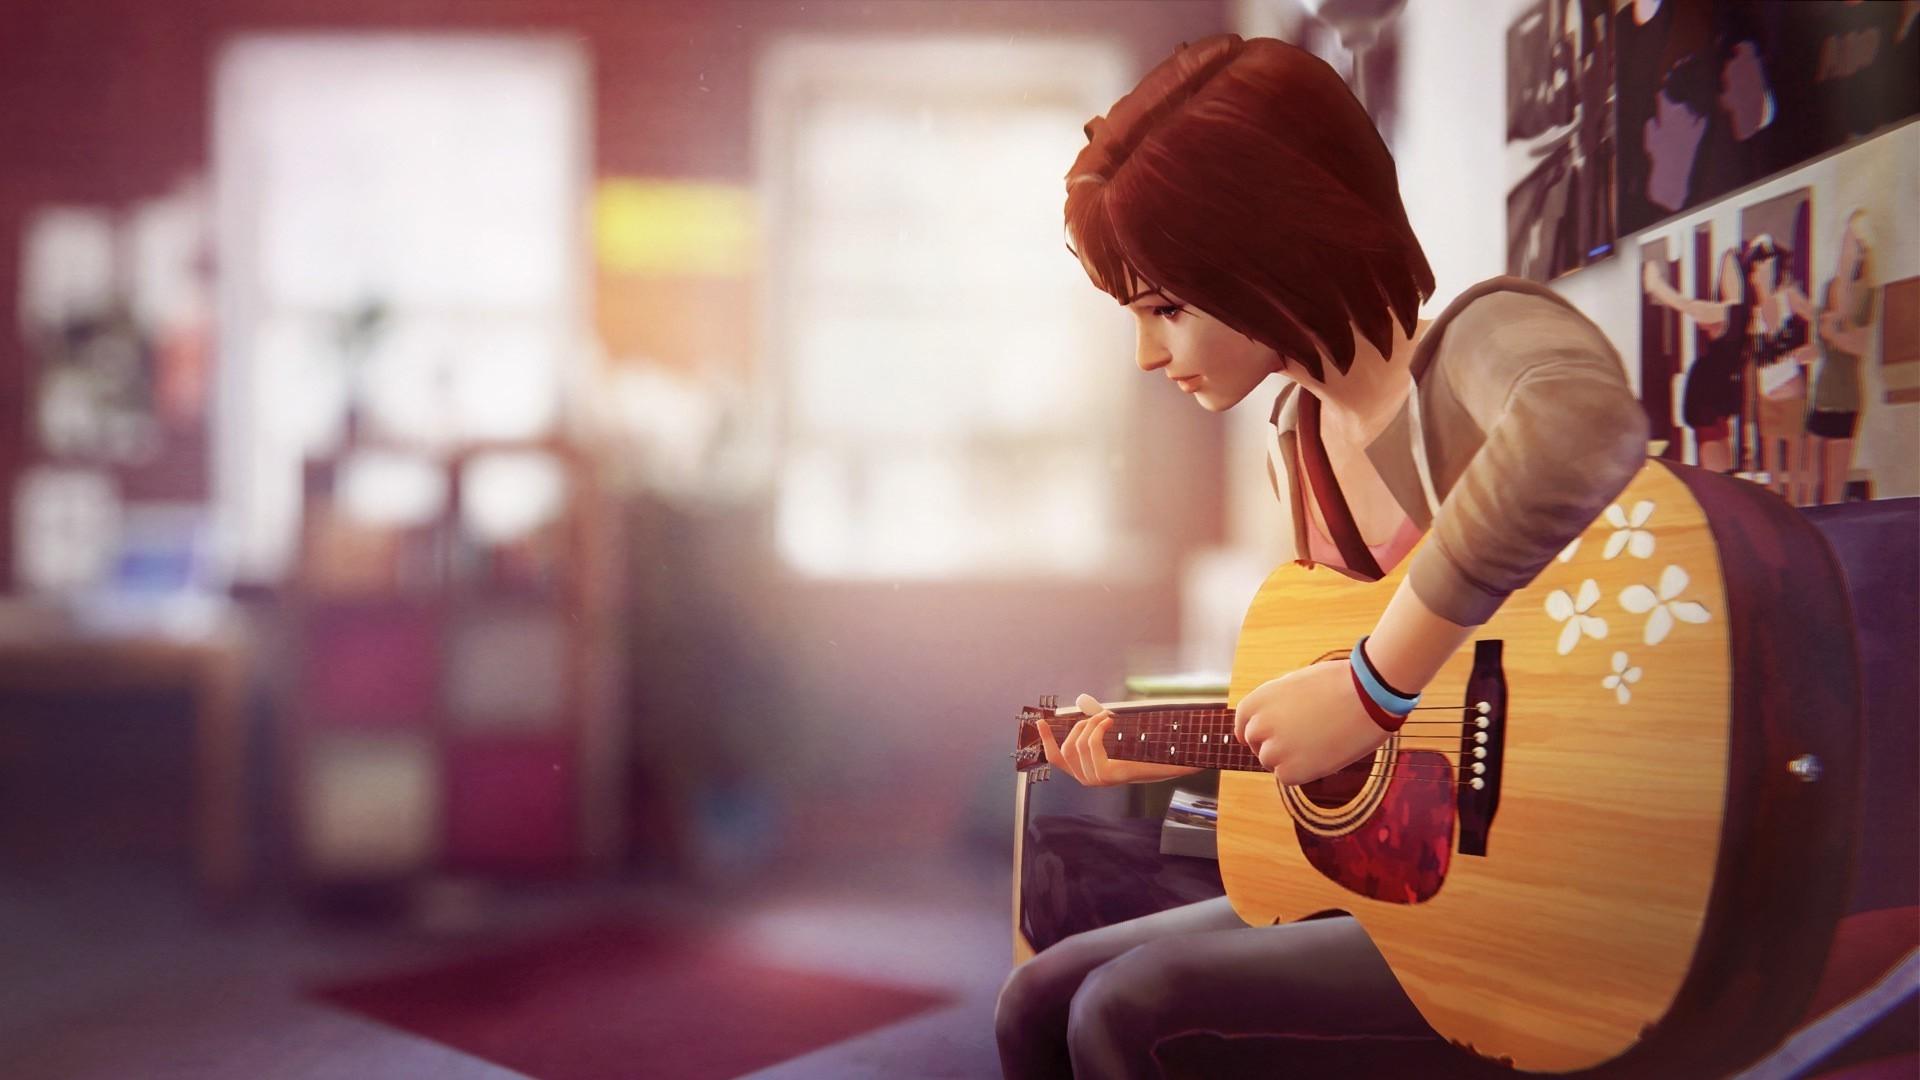 Res: 1920x1080, Anime fantasy girl playing guitar wallpaper